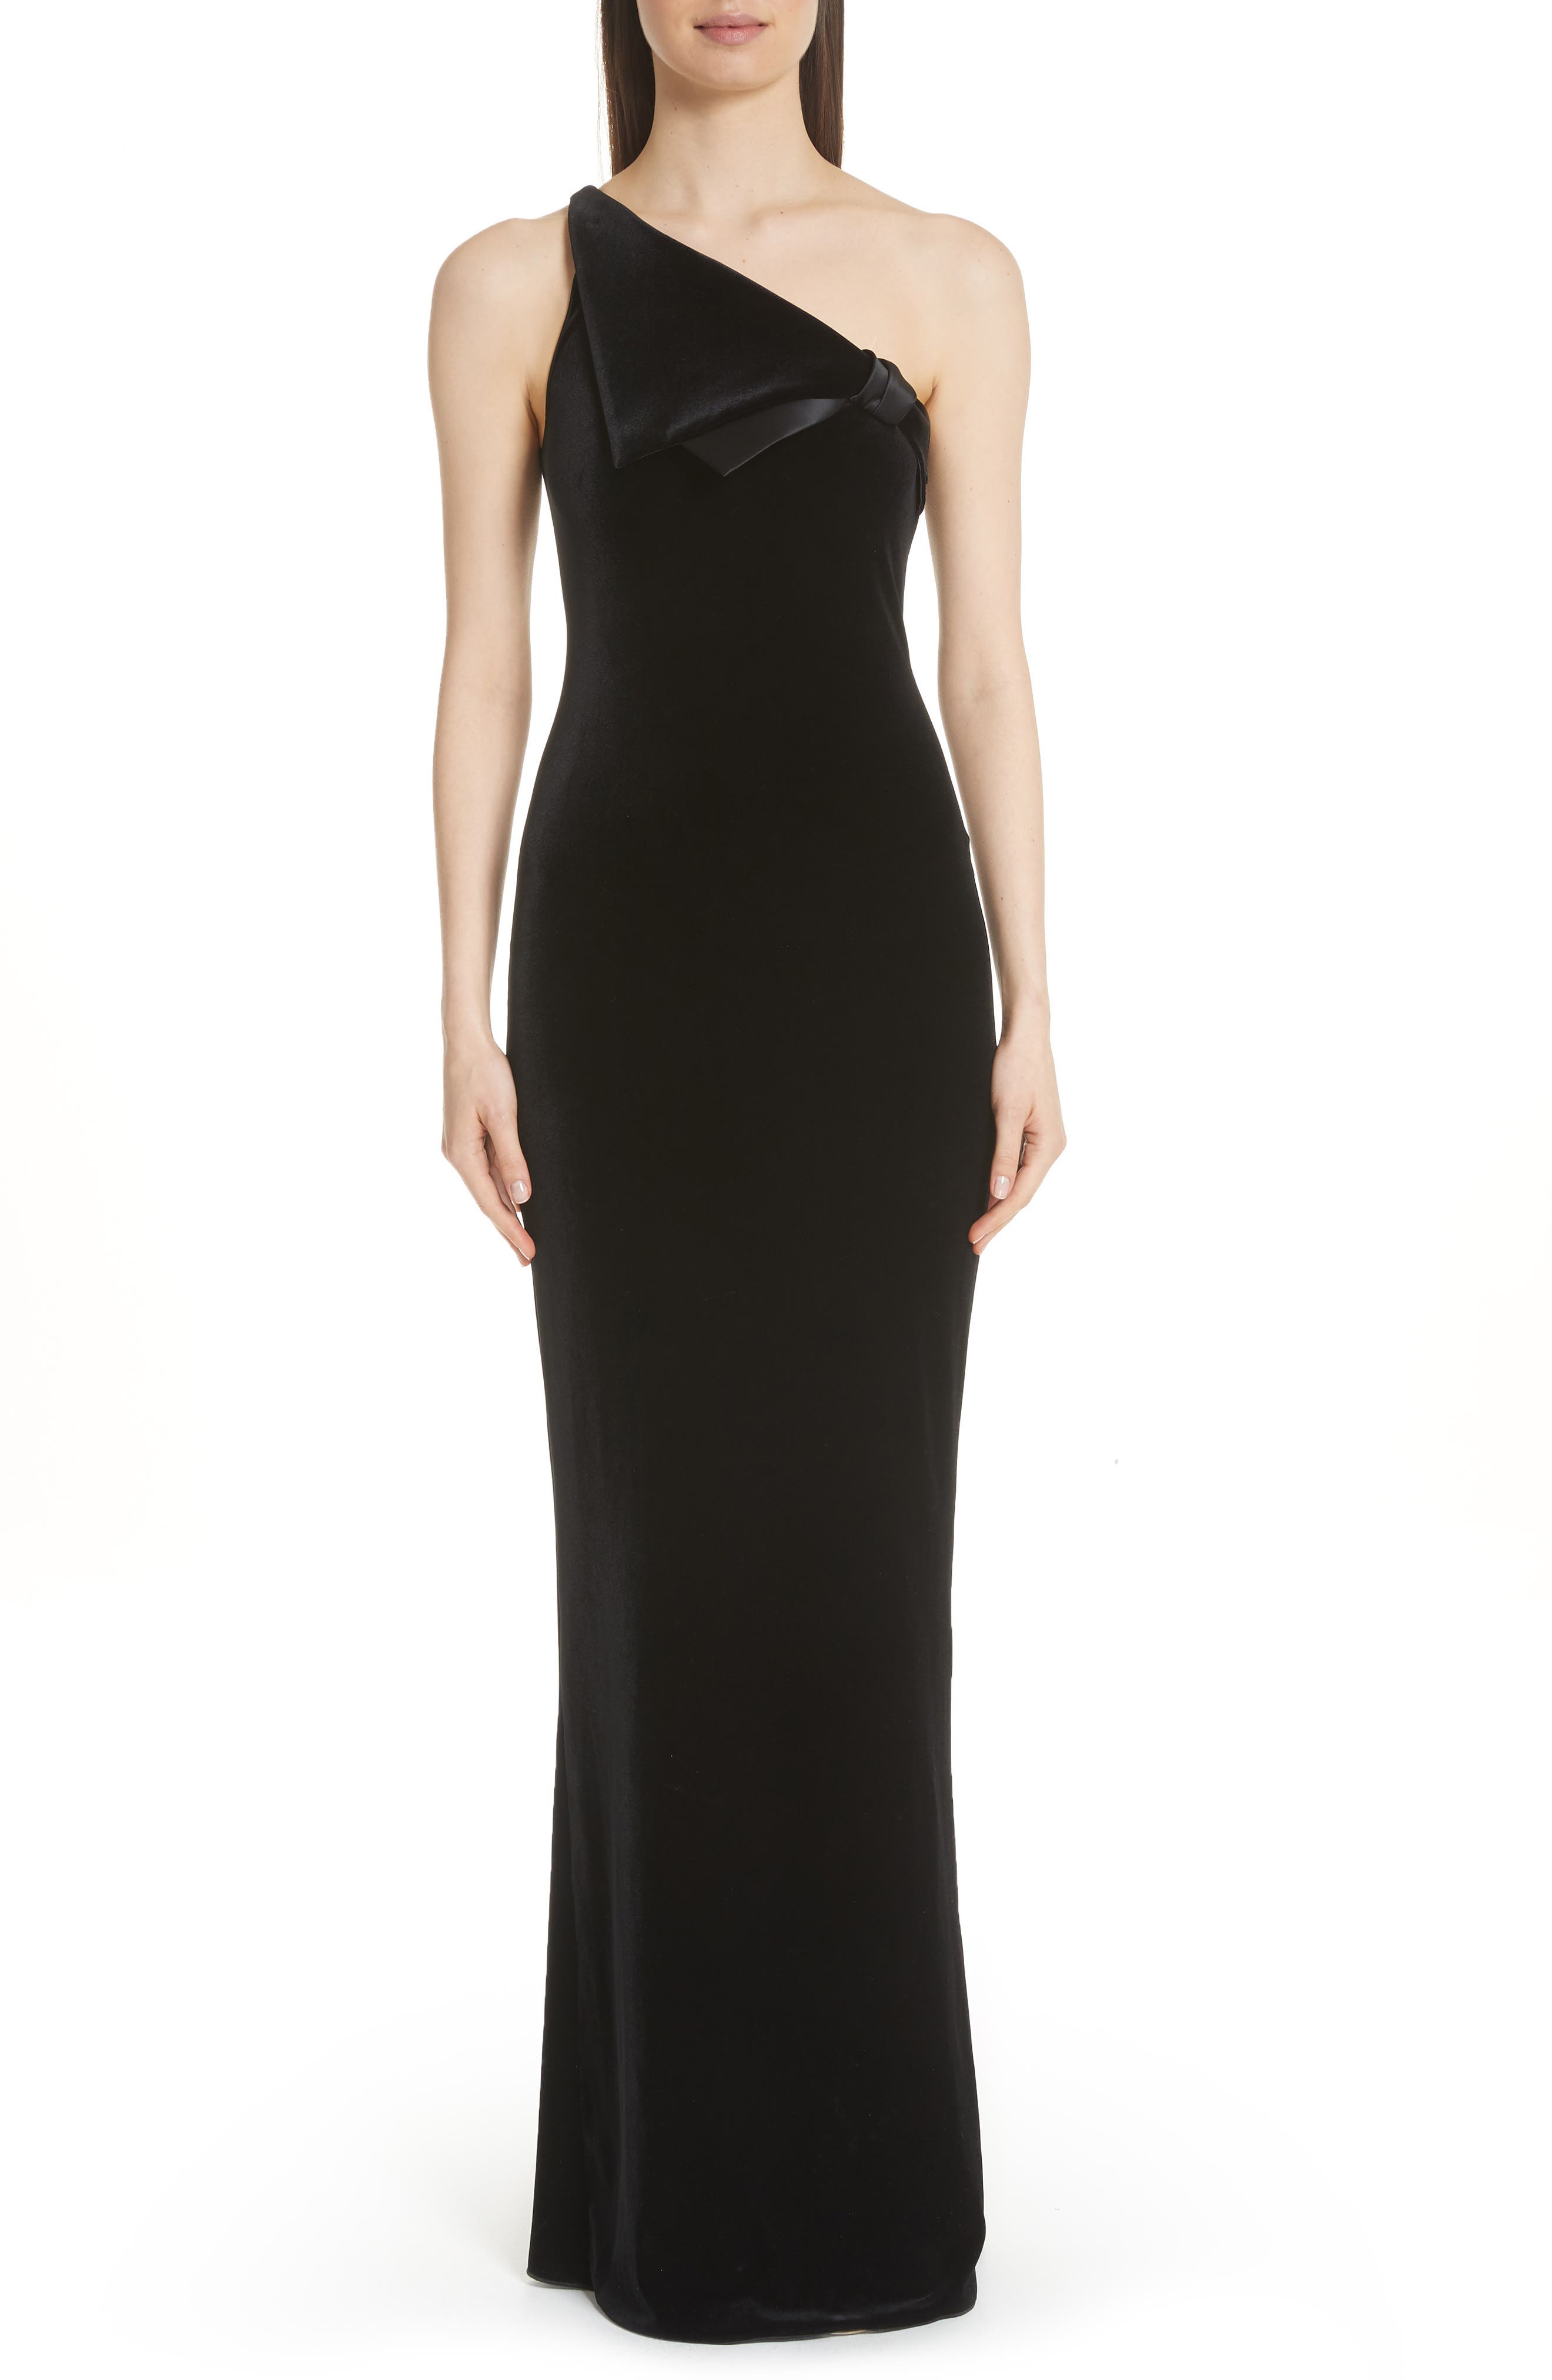 Emporio Armani One Shoulder Gown, US / 46 IT - Black